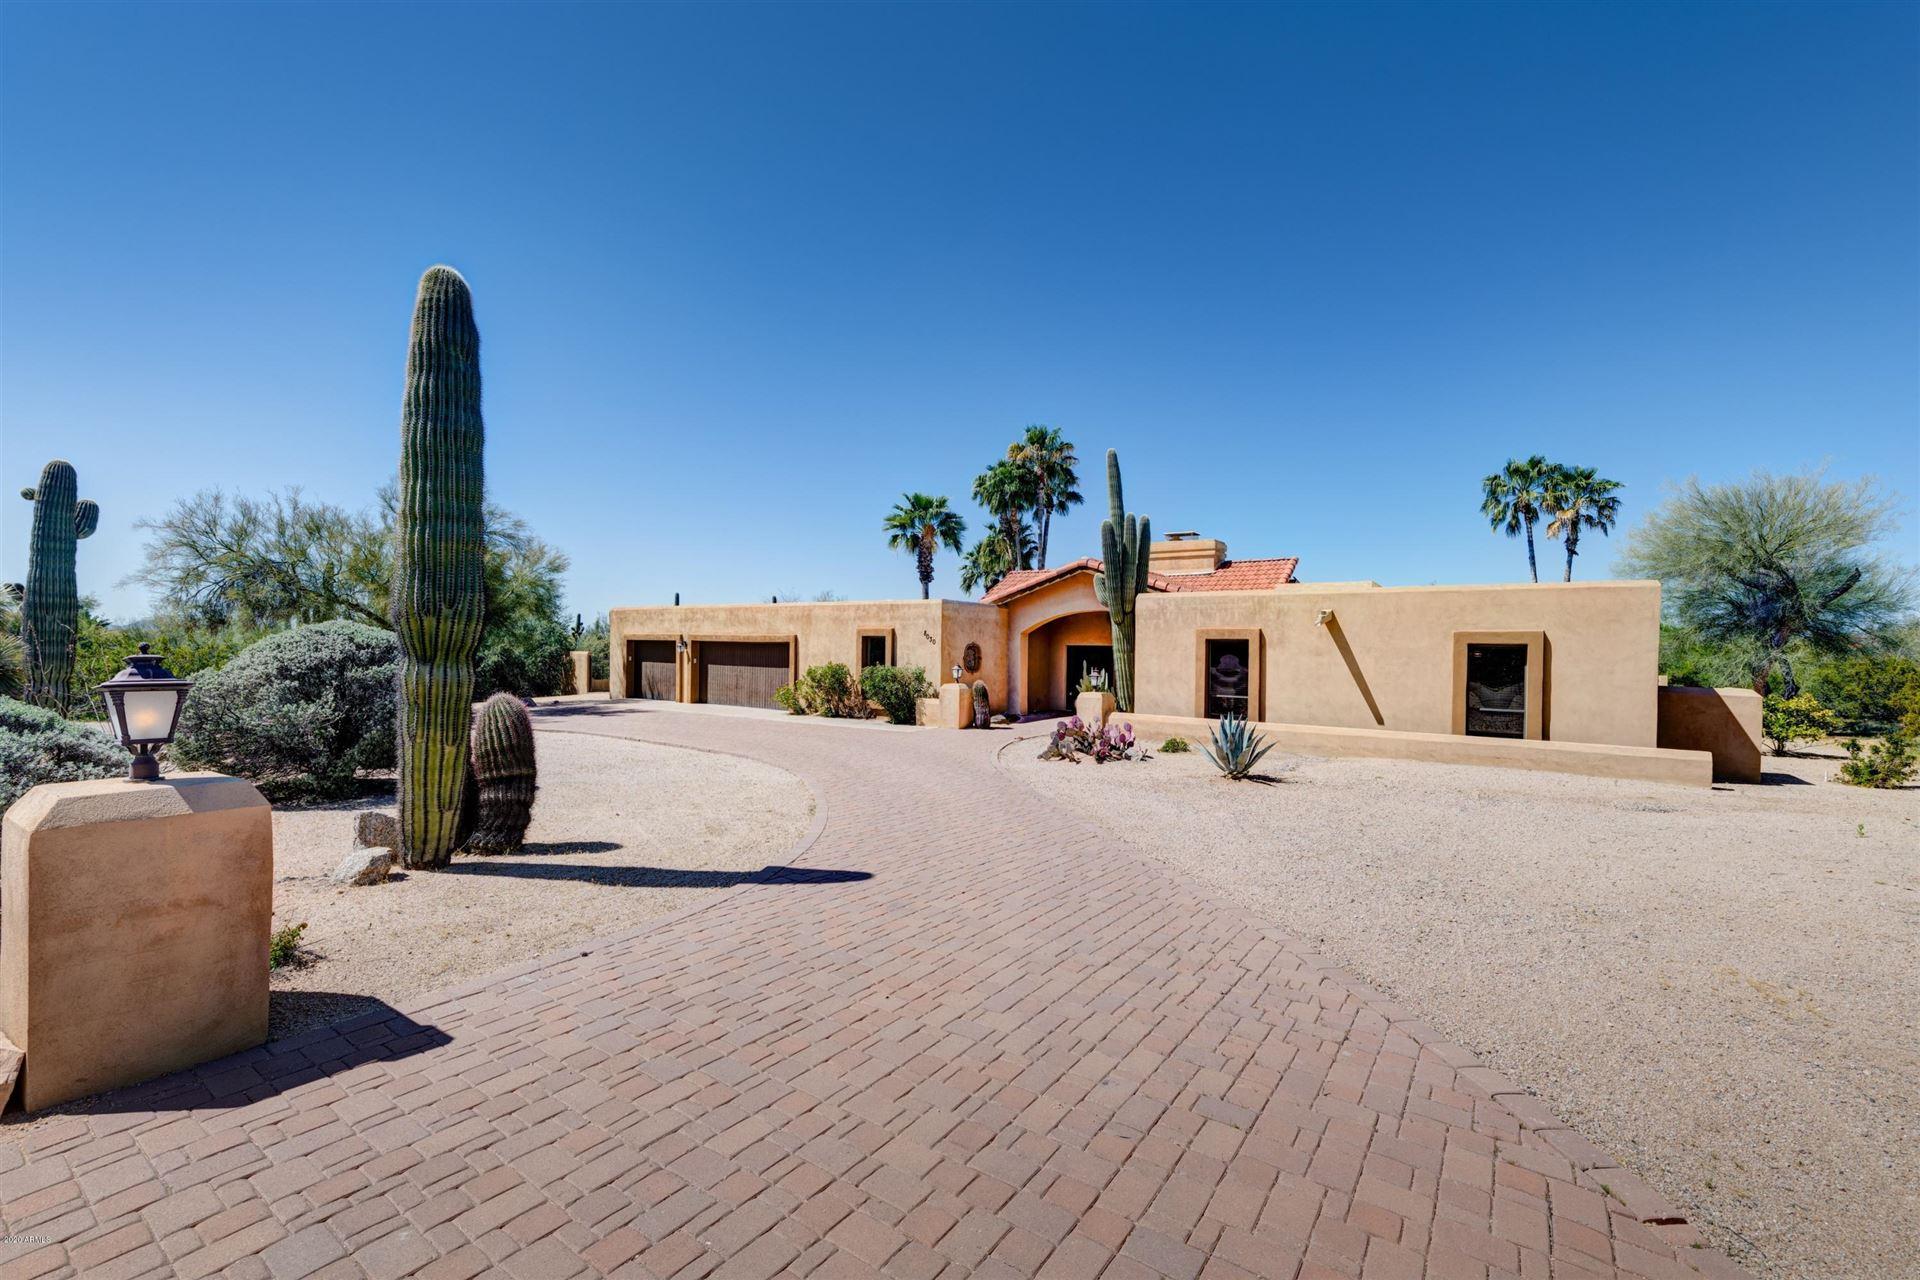 8030 E SANDS Drive, Scottsdale, AZ 85255 - #: 6054104